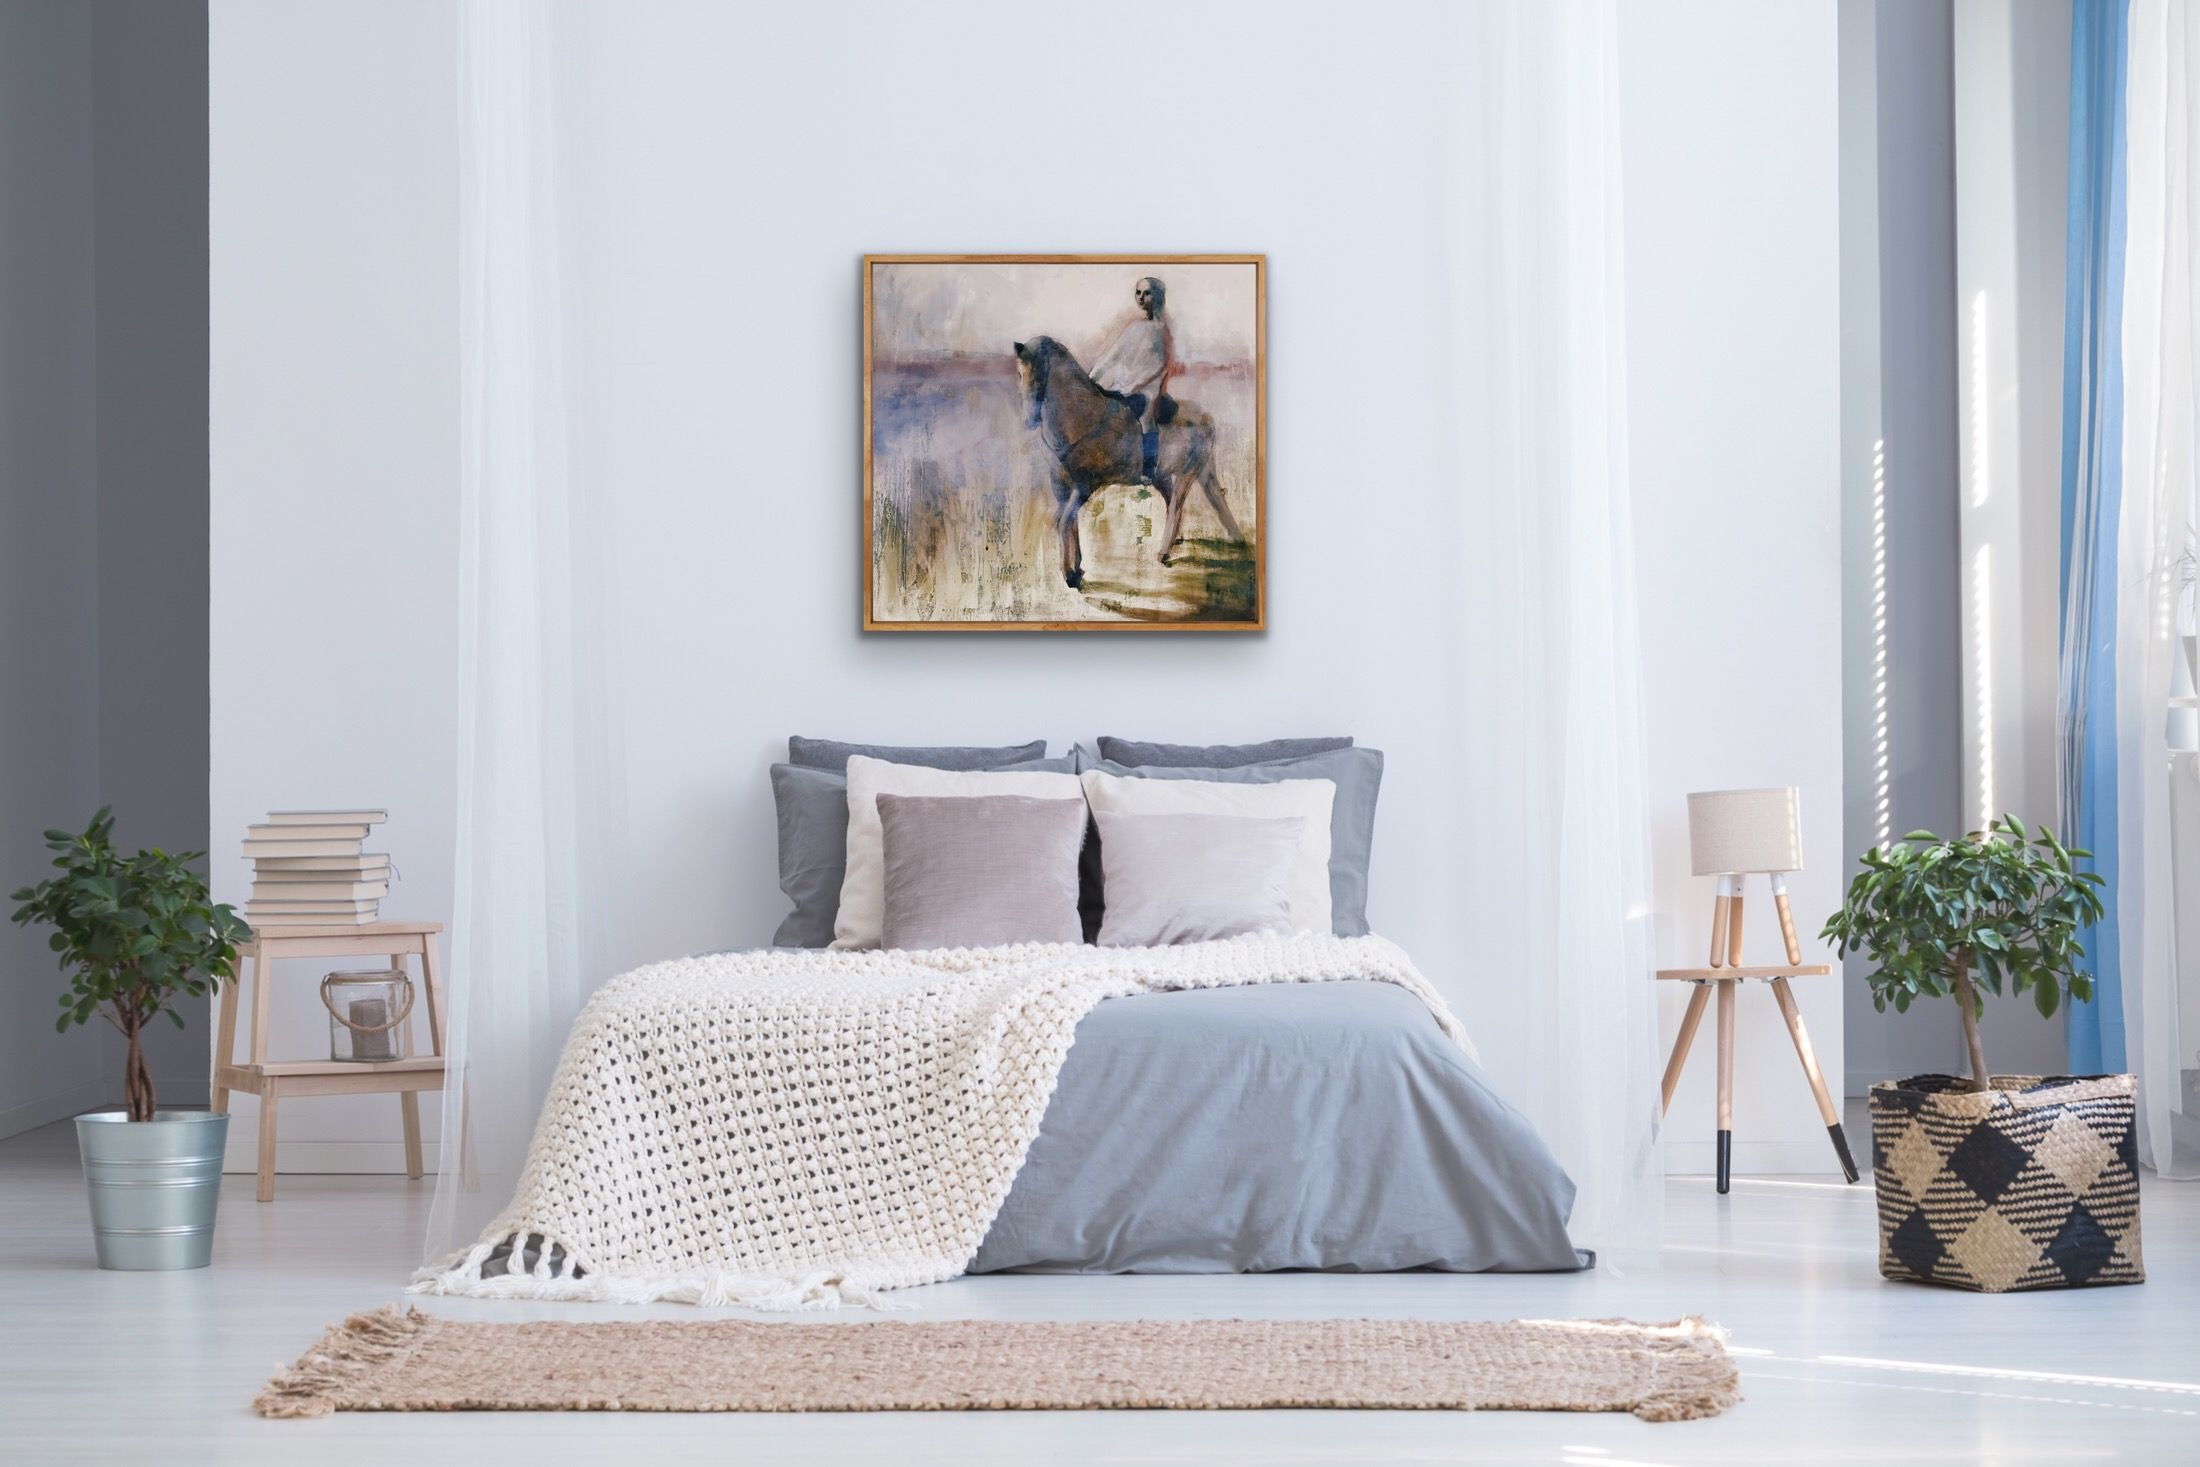 Dreamy Rider on Horse Image Print Home decor, Decor, Home